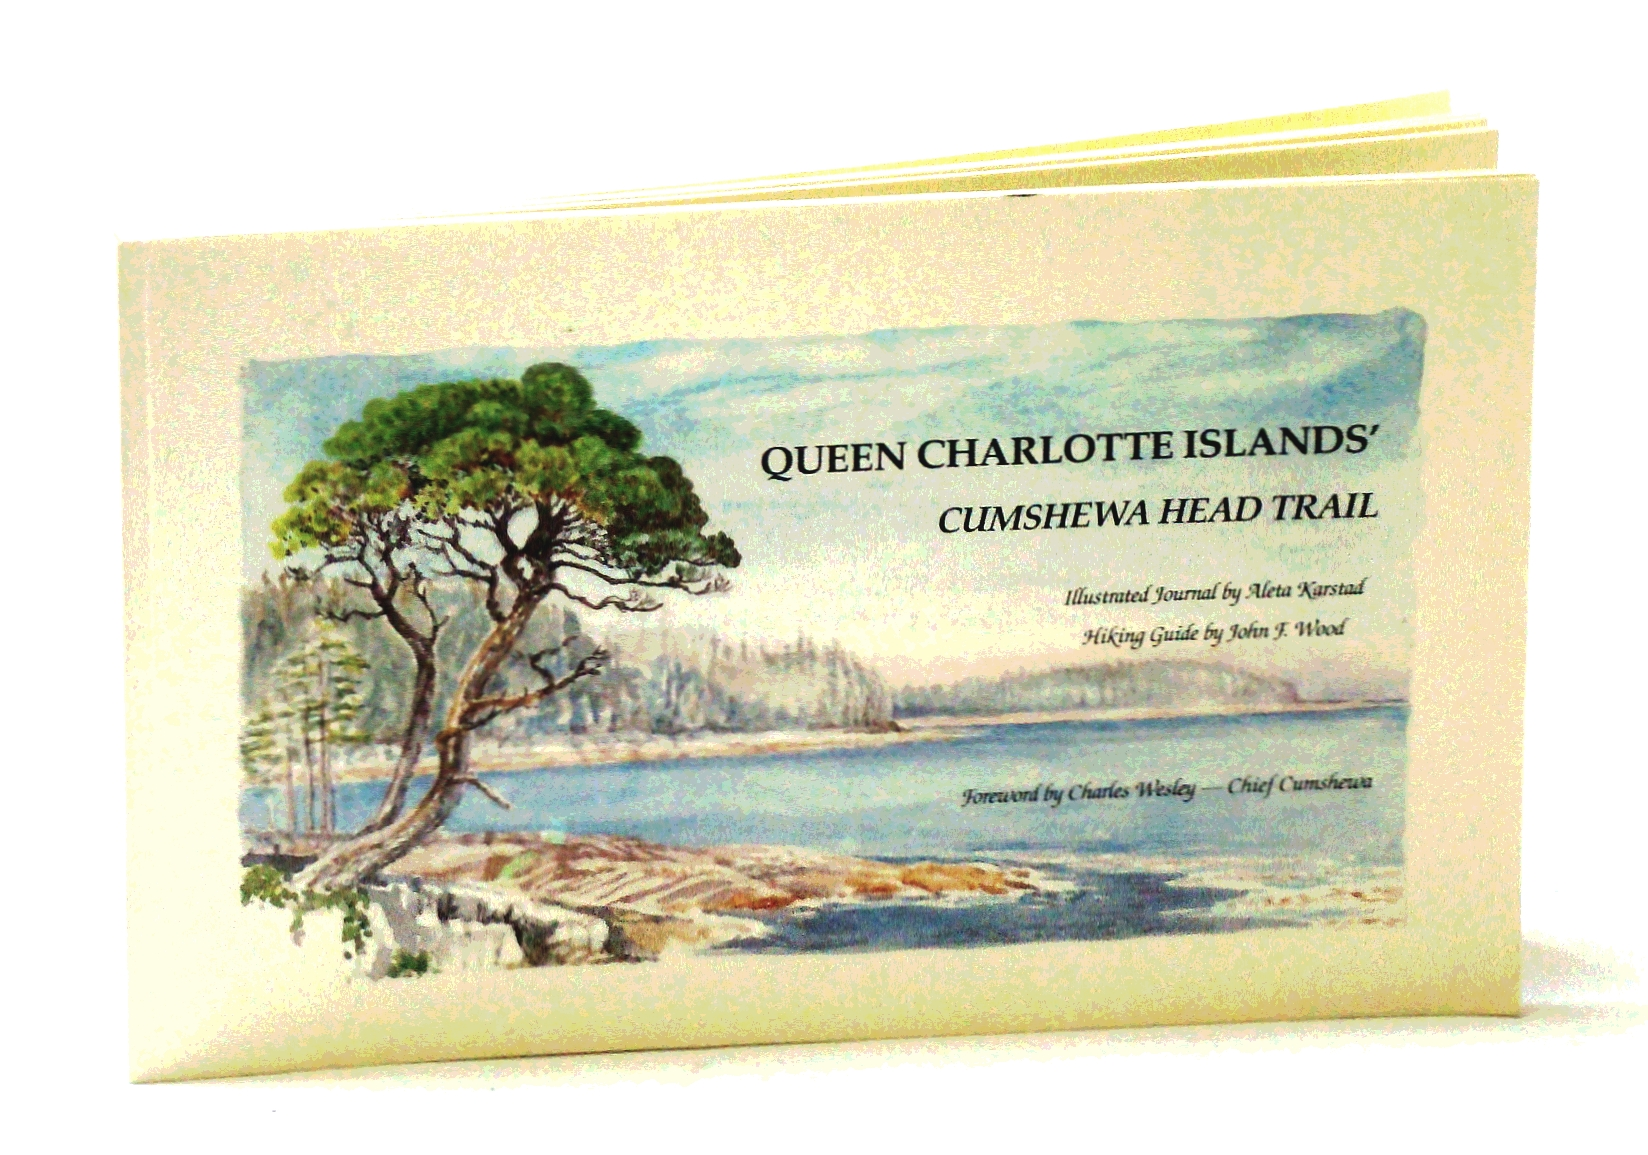 Queen Charlotte Islands' Cumshewa Head Trail